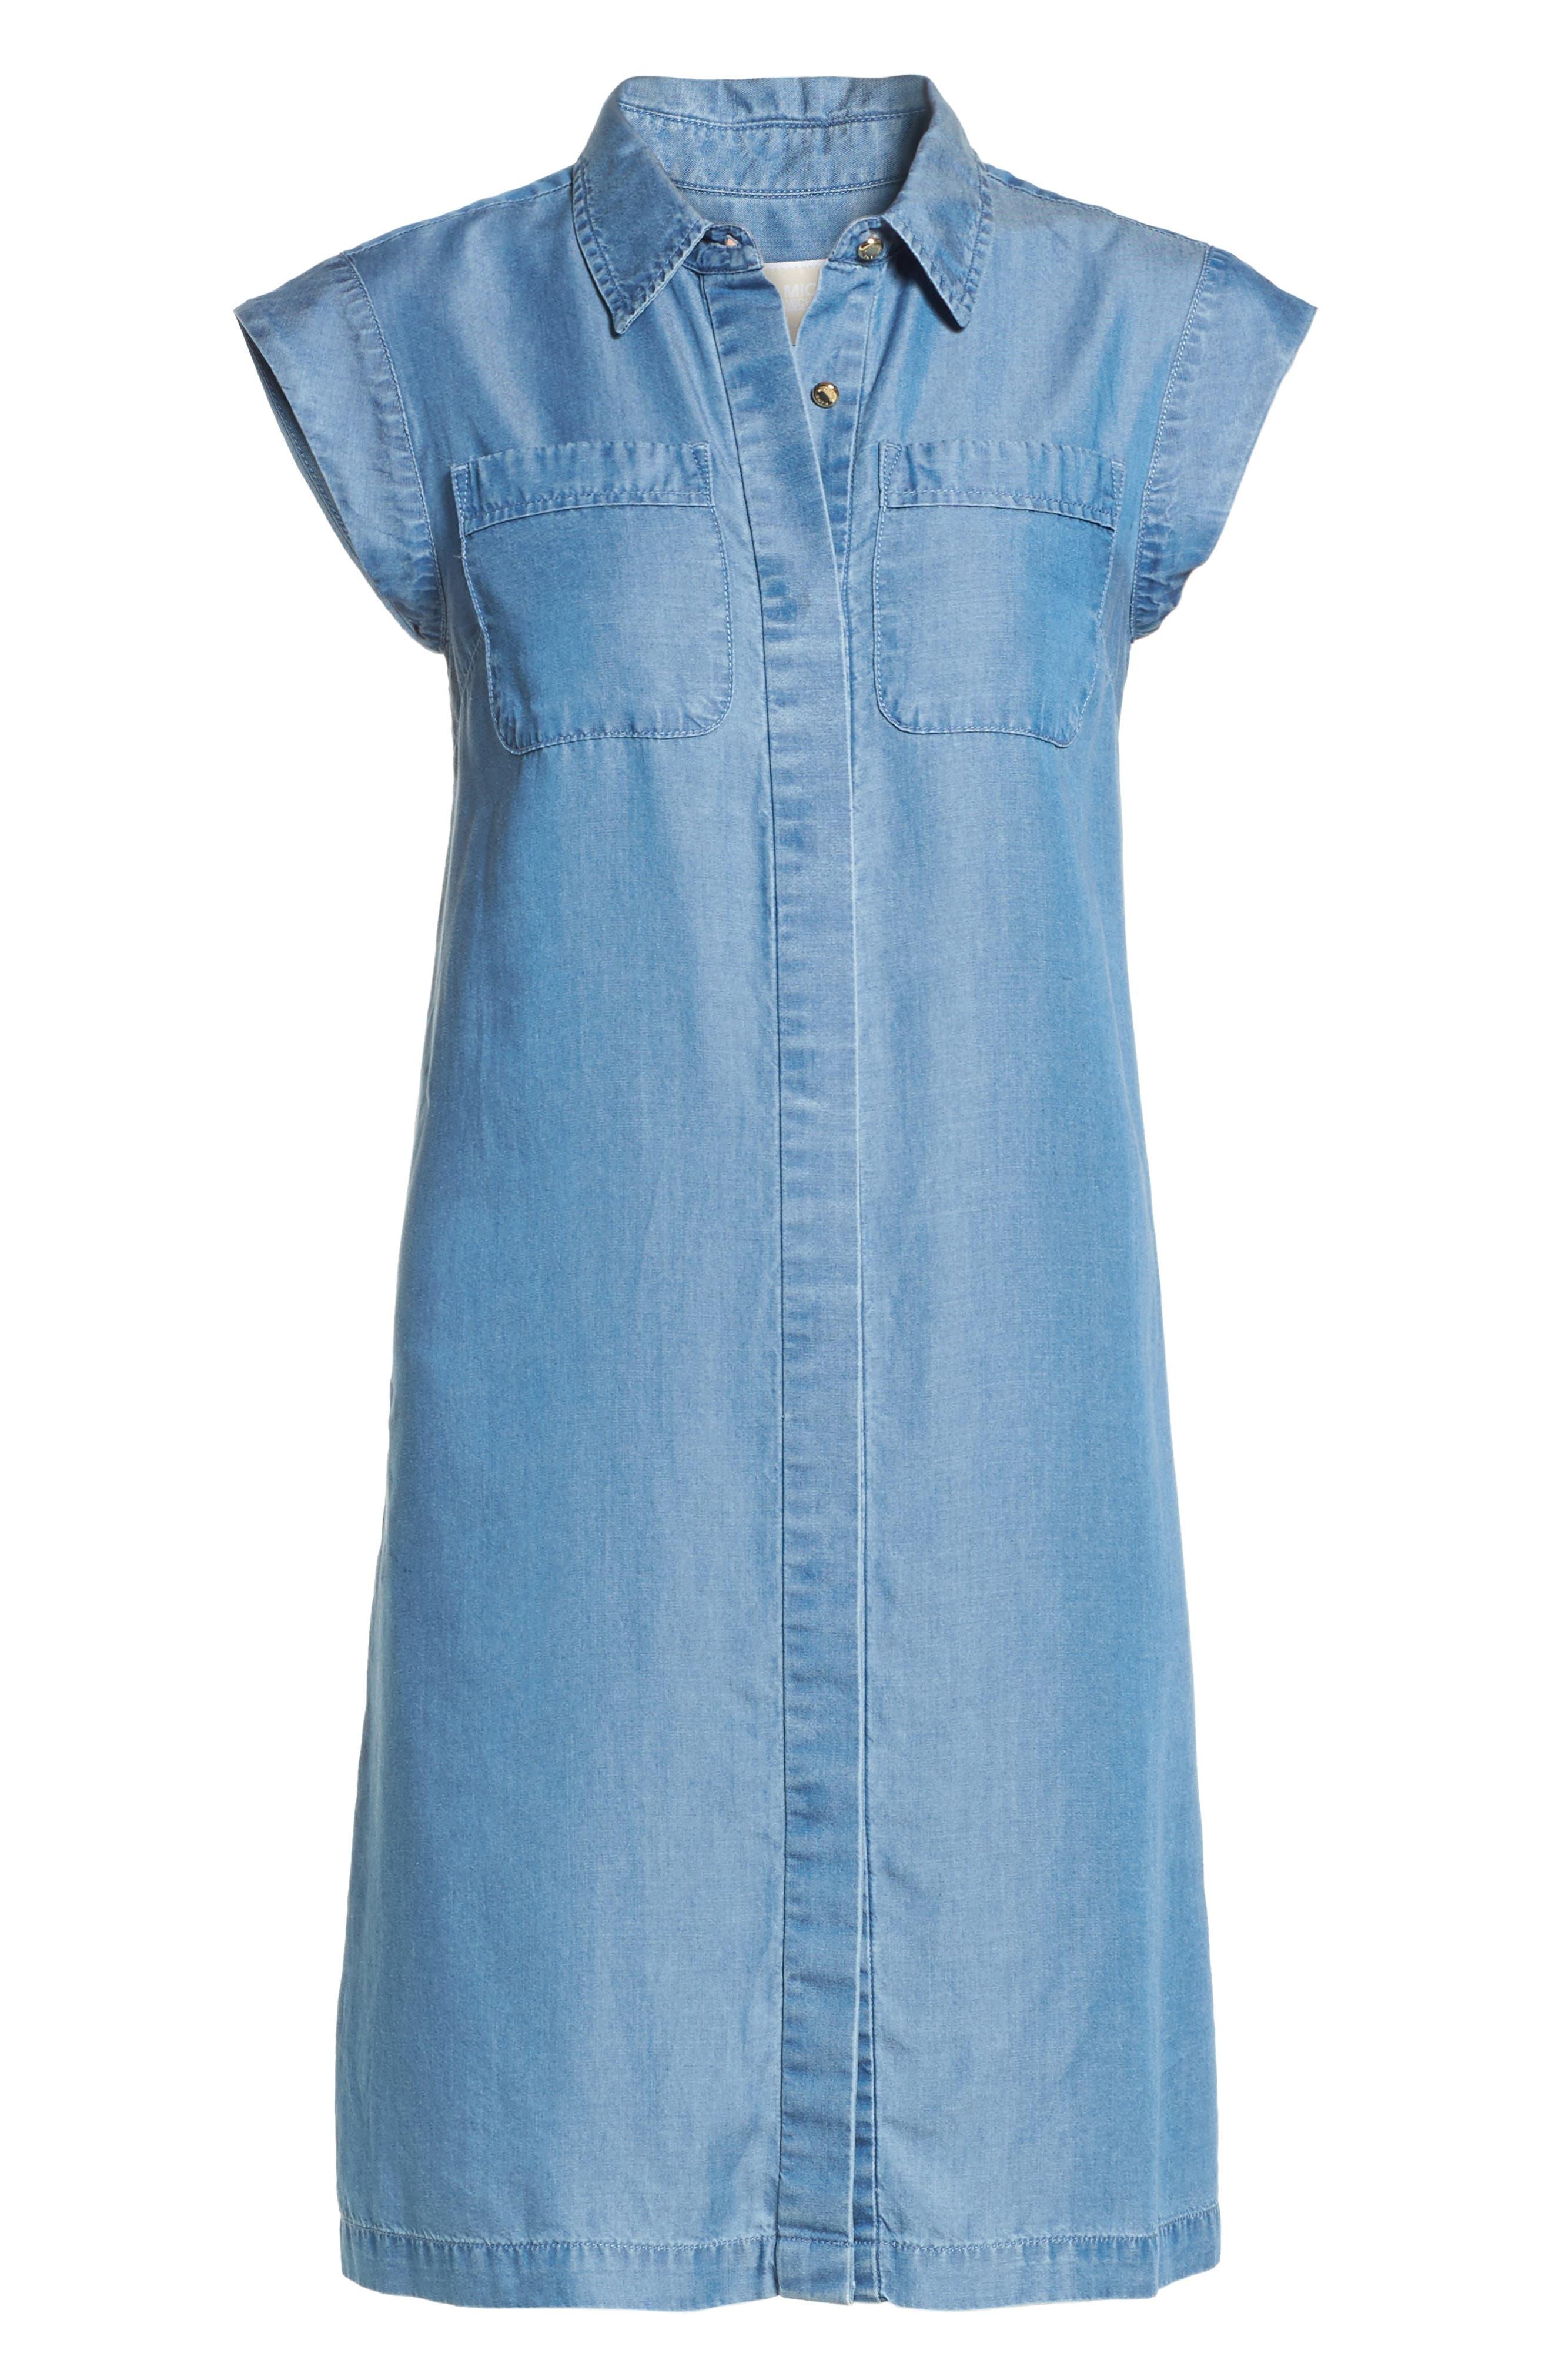 MICHAEL MICHAEL KORS, Patch Pocket Chambray Shirtdress, Alternate thumbnail 6, color, 401